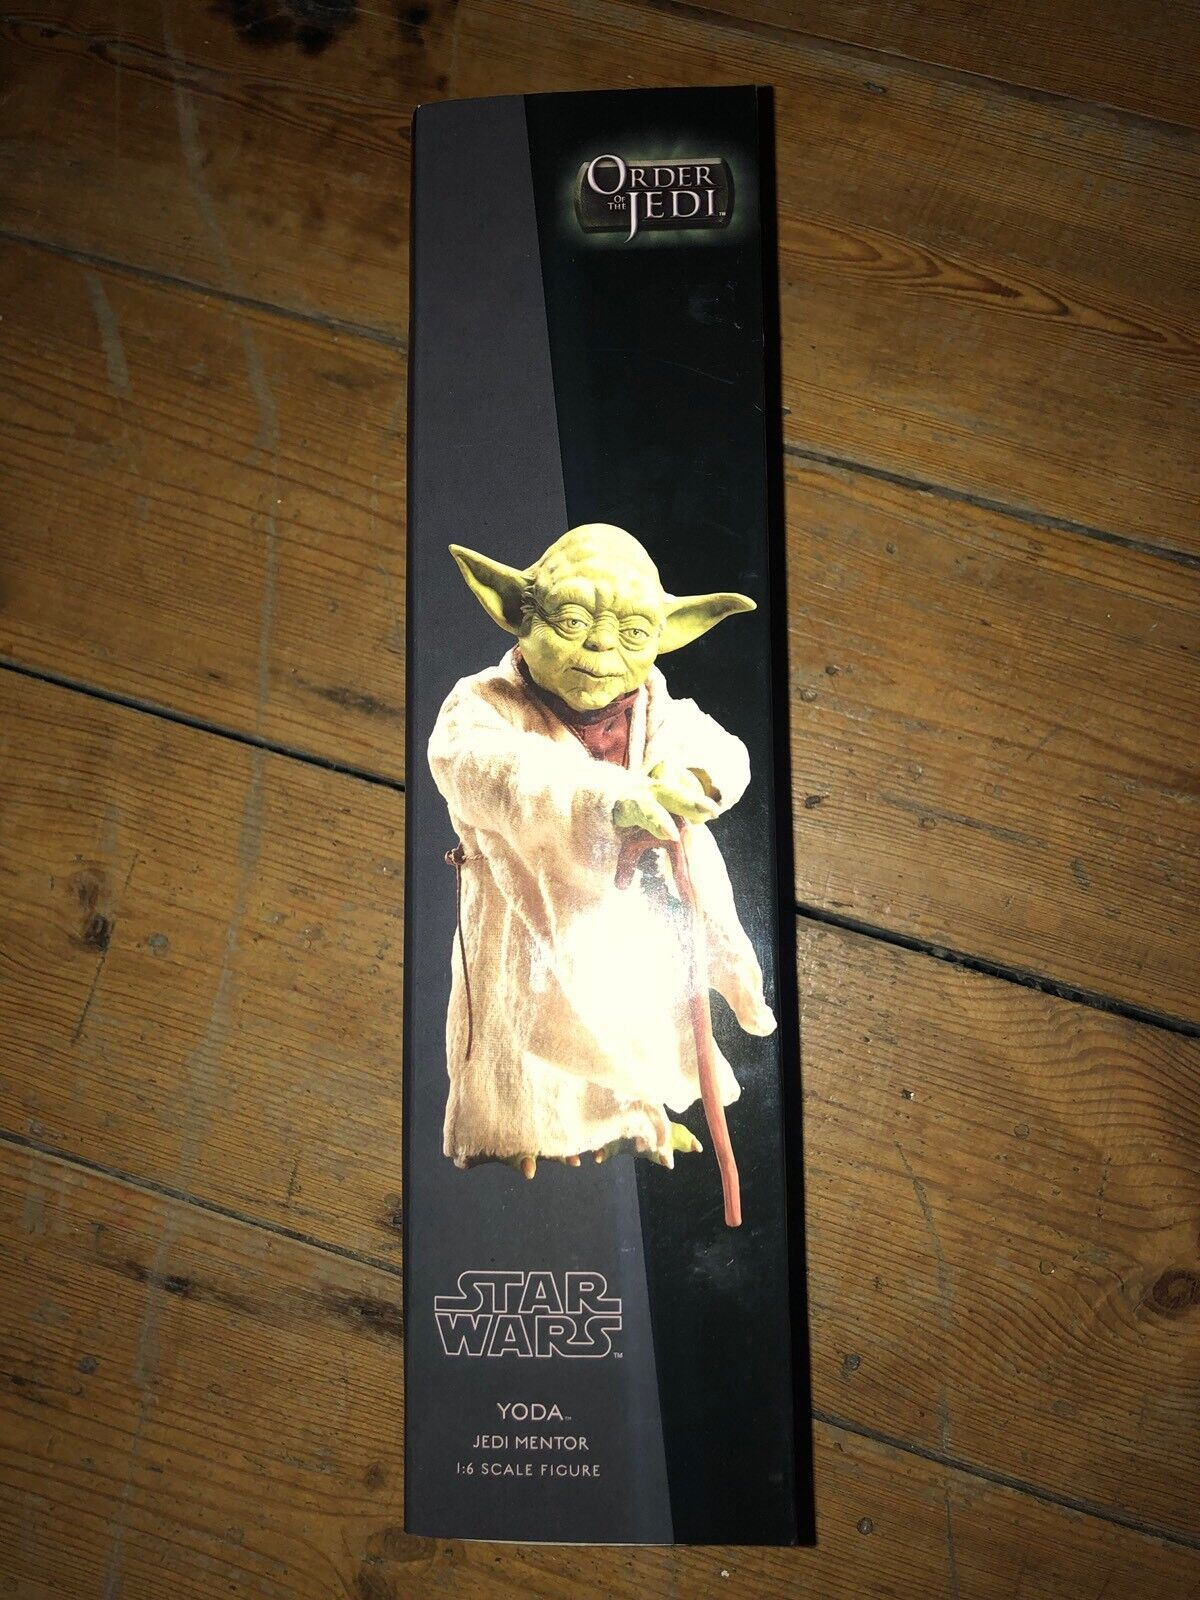 Sideshow Star Wars 0 rder du Jedi Jedi Jedi Yoda Jedi Hommes tor afssc 1048 791e9e